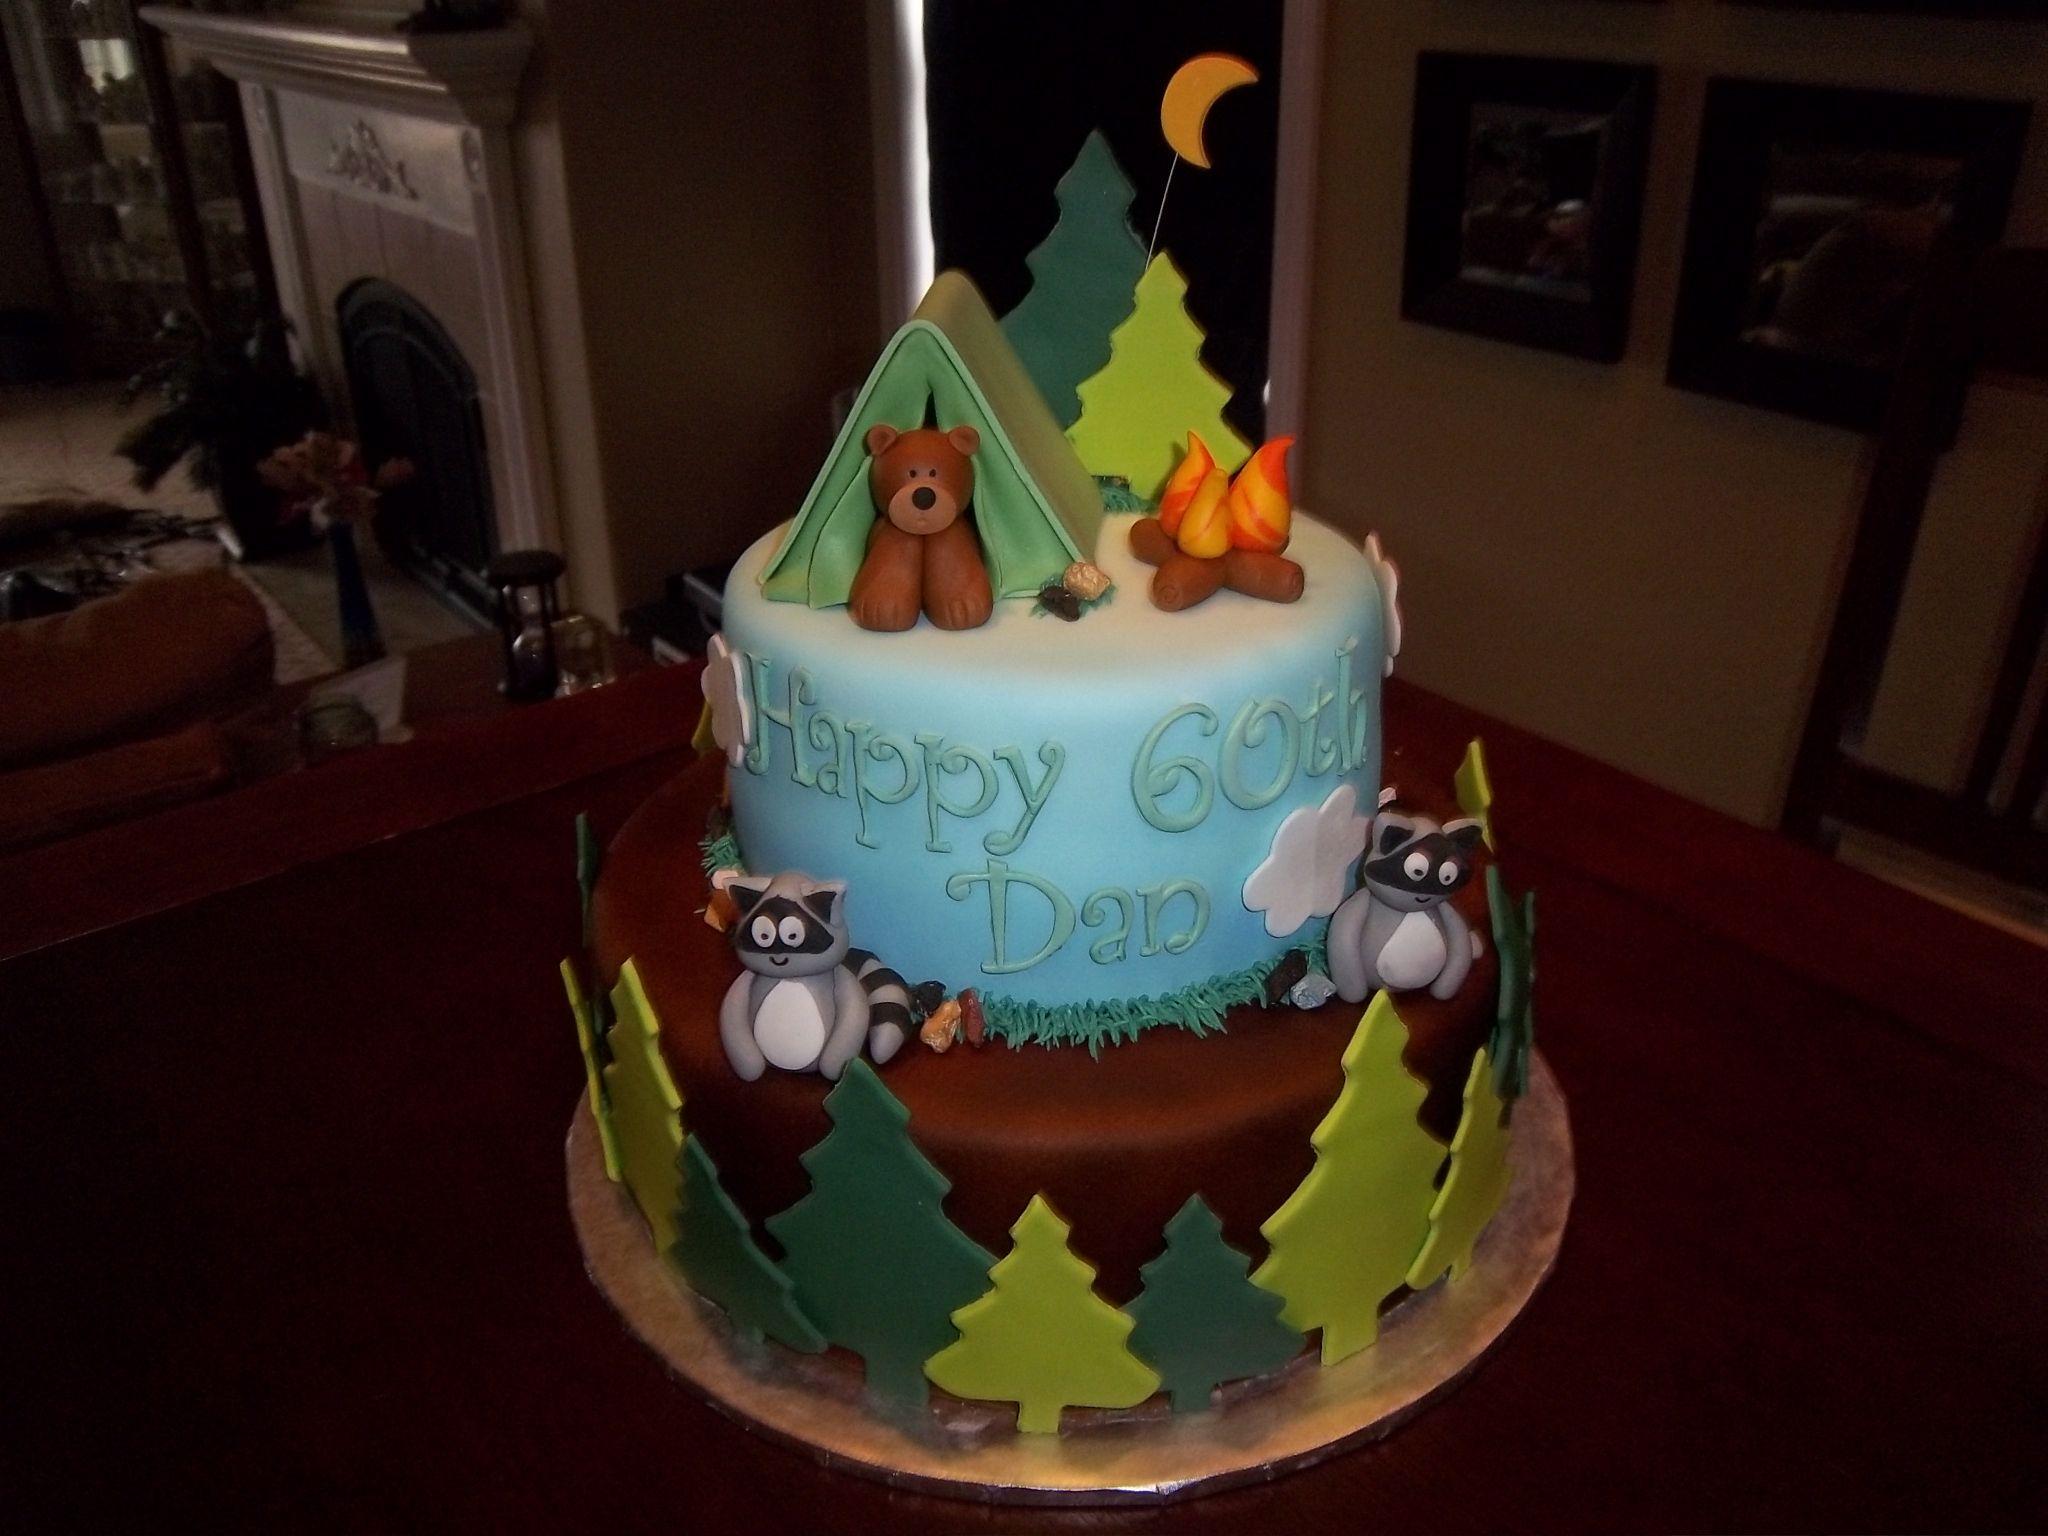 Fantastic Camping Theme 60Th Birthday Cake With Images Camping Birthday Funny Birthday Cards Online Bapapcheapnameinfo